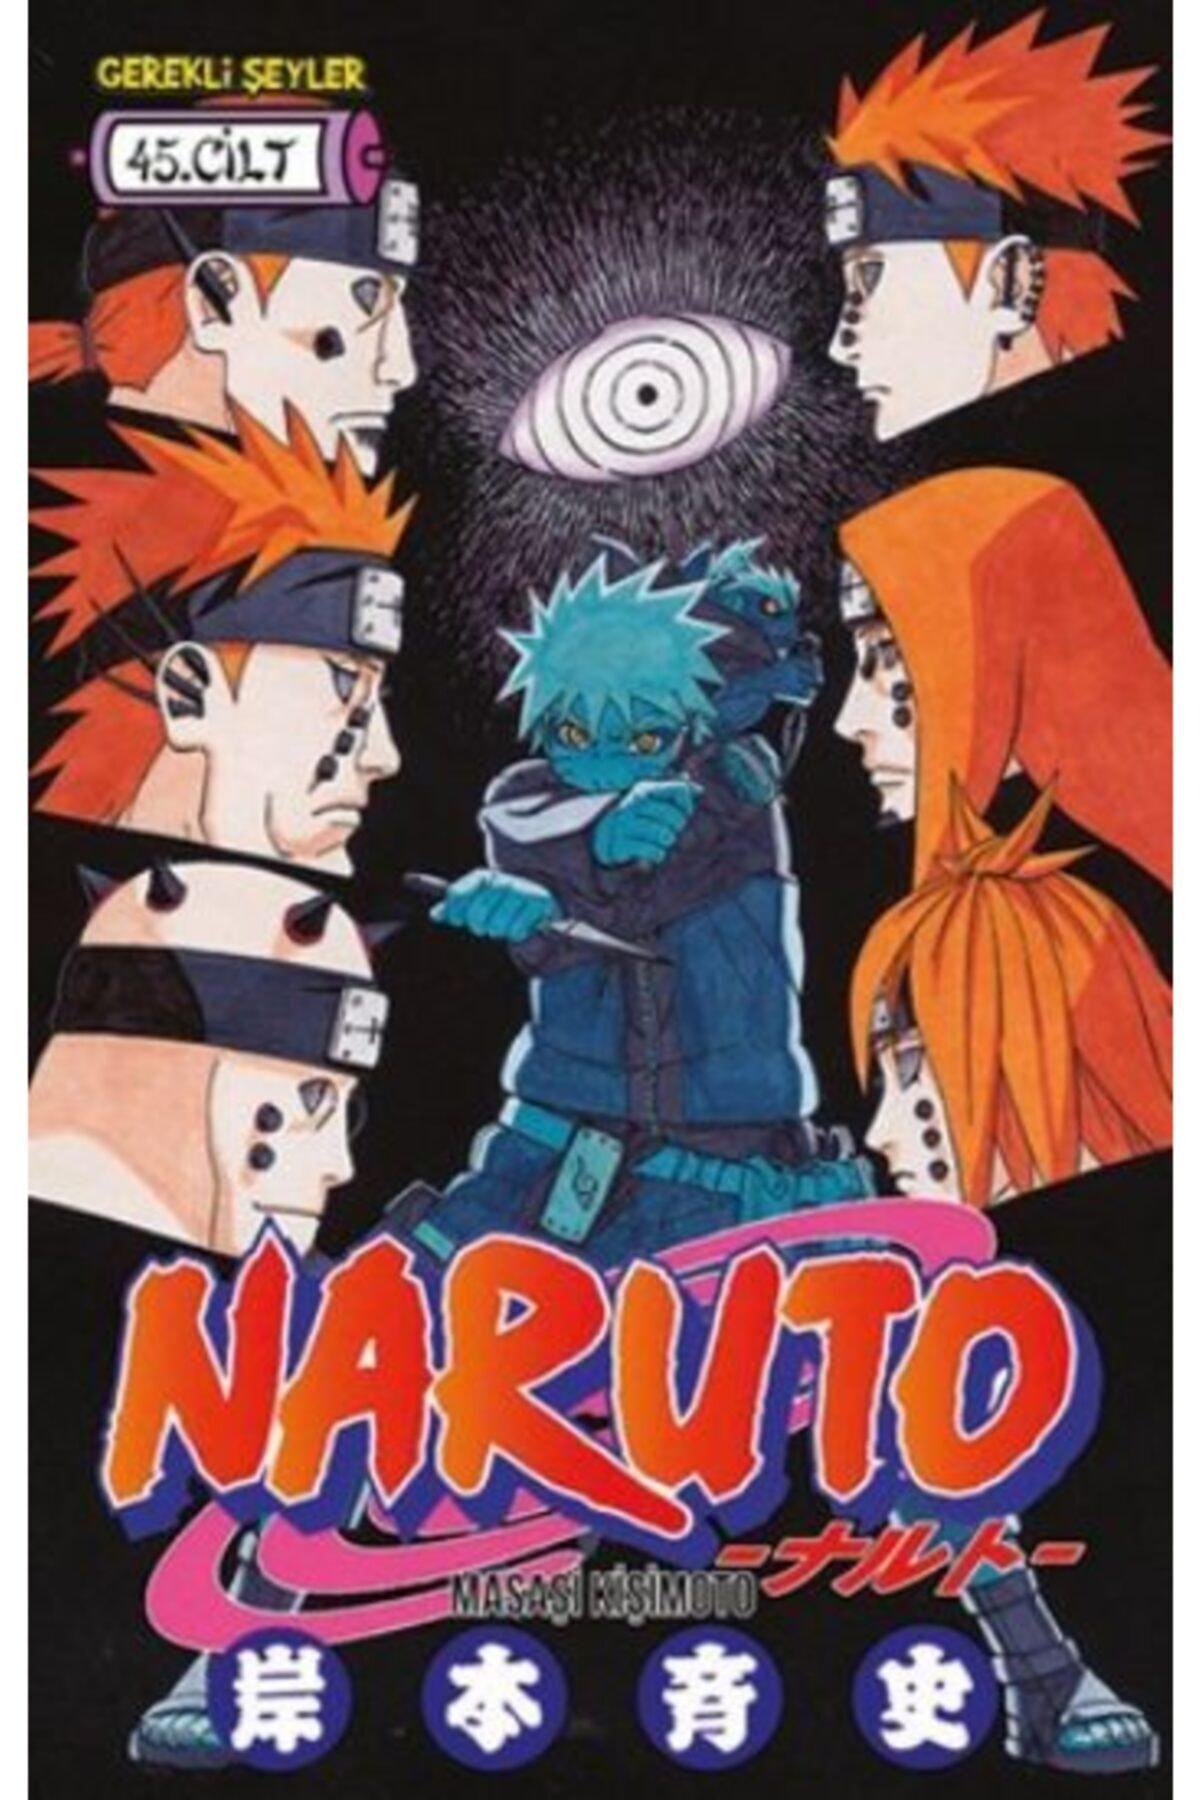 Gerekli Şeyler Naruto 45 1